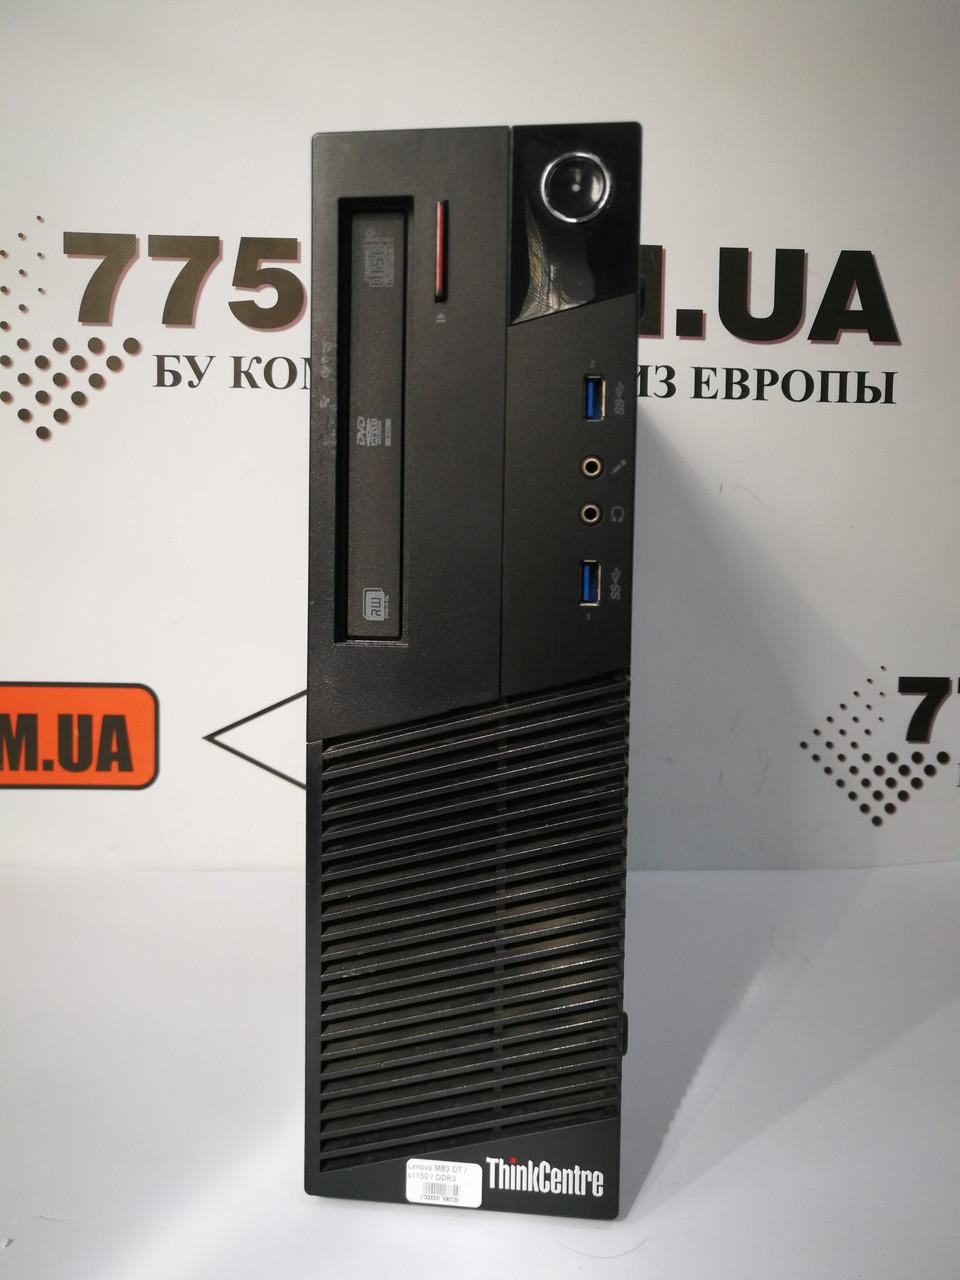 Компьютер Lenovo M83, Intel Сore i5-4570 3.3GHz, RAM 8ГБ, SSD 120ГБ